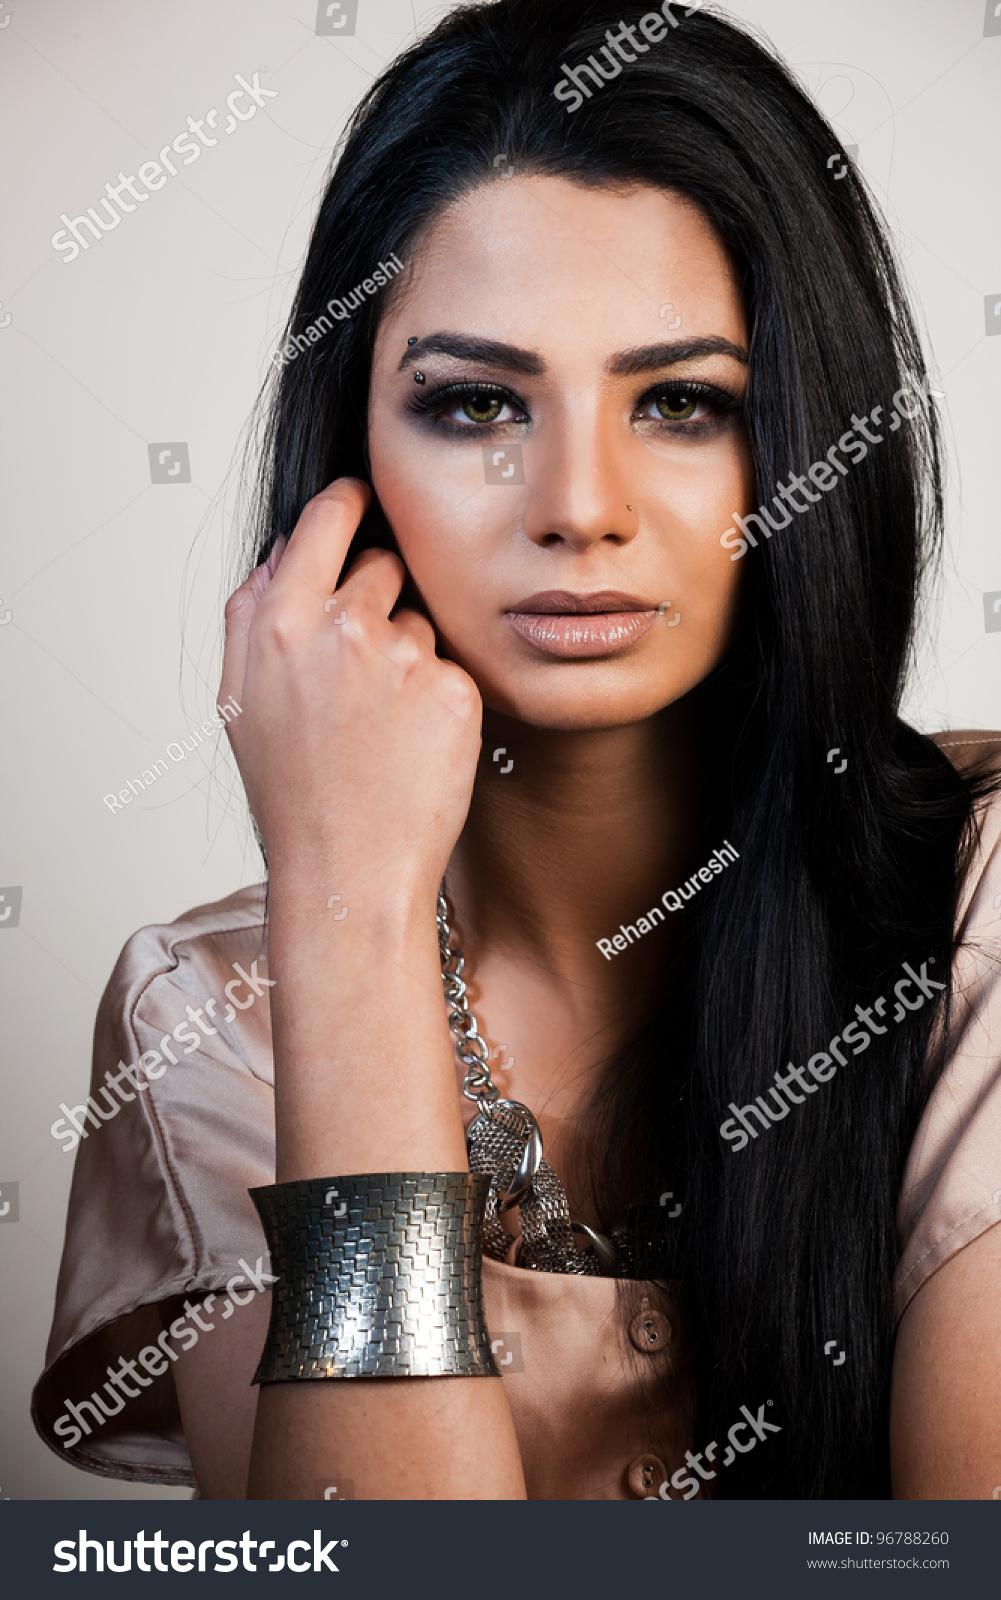 Mixed race fashion models